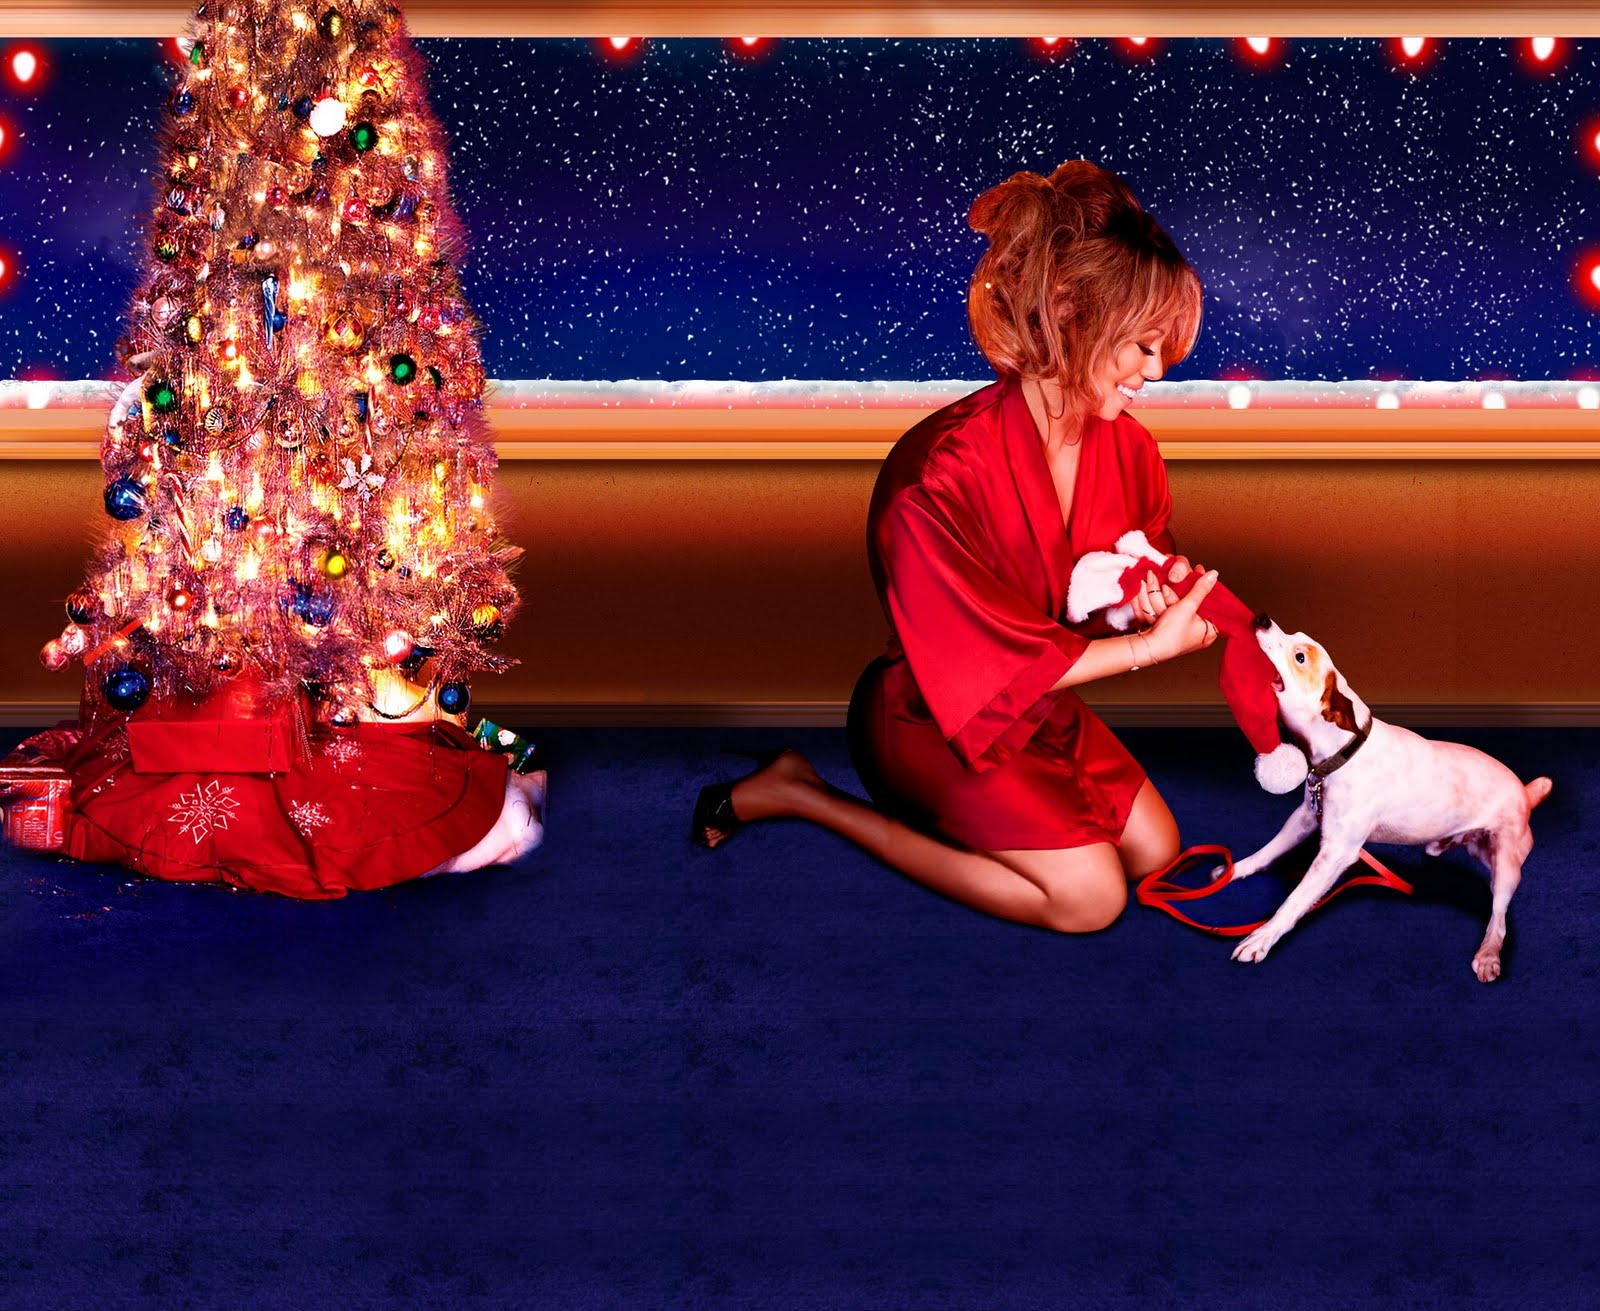 mariah22 Hot Shots: Mariah Carey Glows In New Desktop Wallpapers